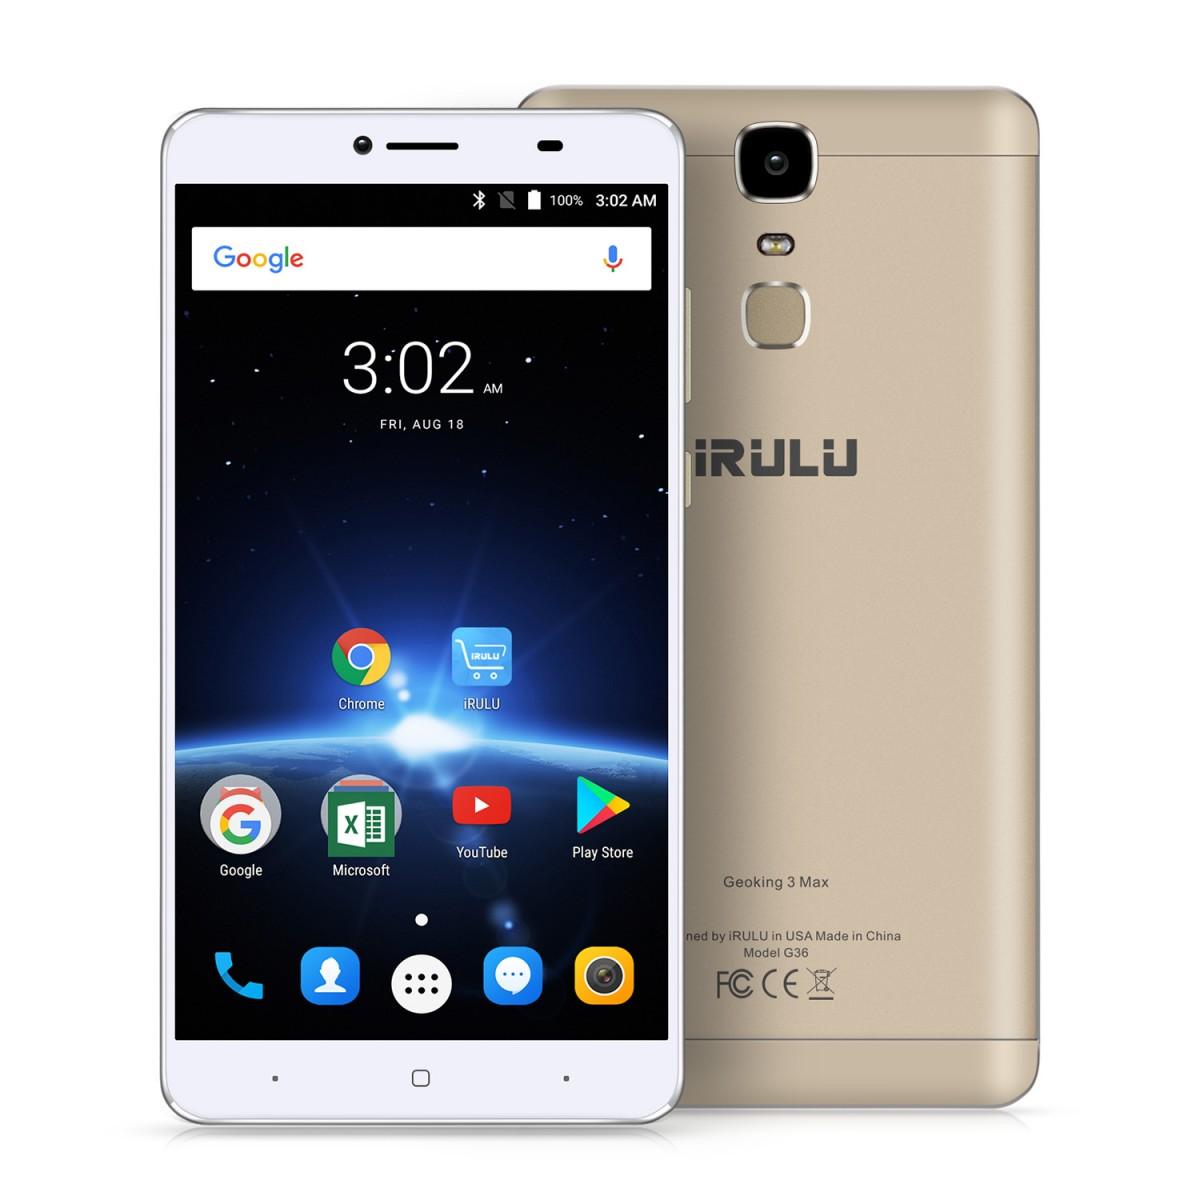 iRULU GeoKing 3 Max Smartphone (G3 Max) $149.99 @irulu